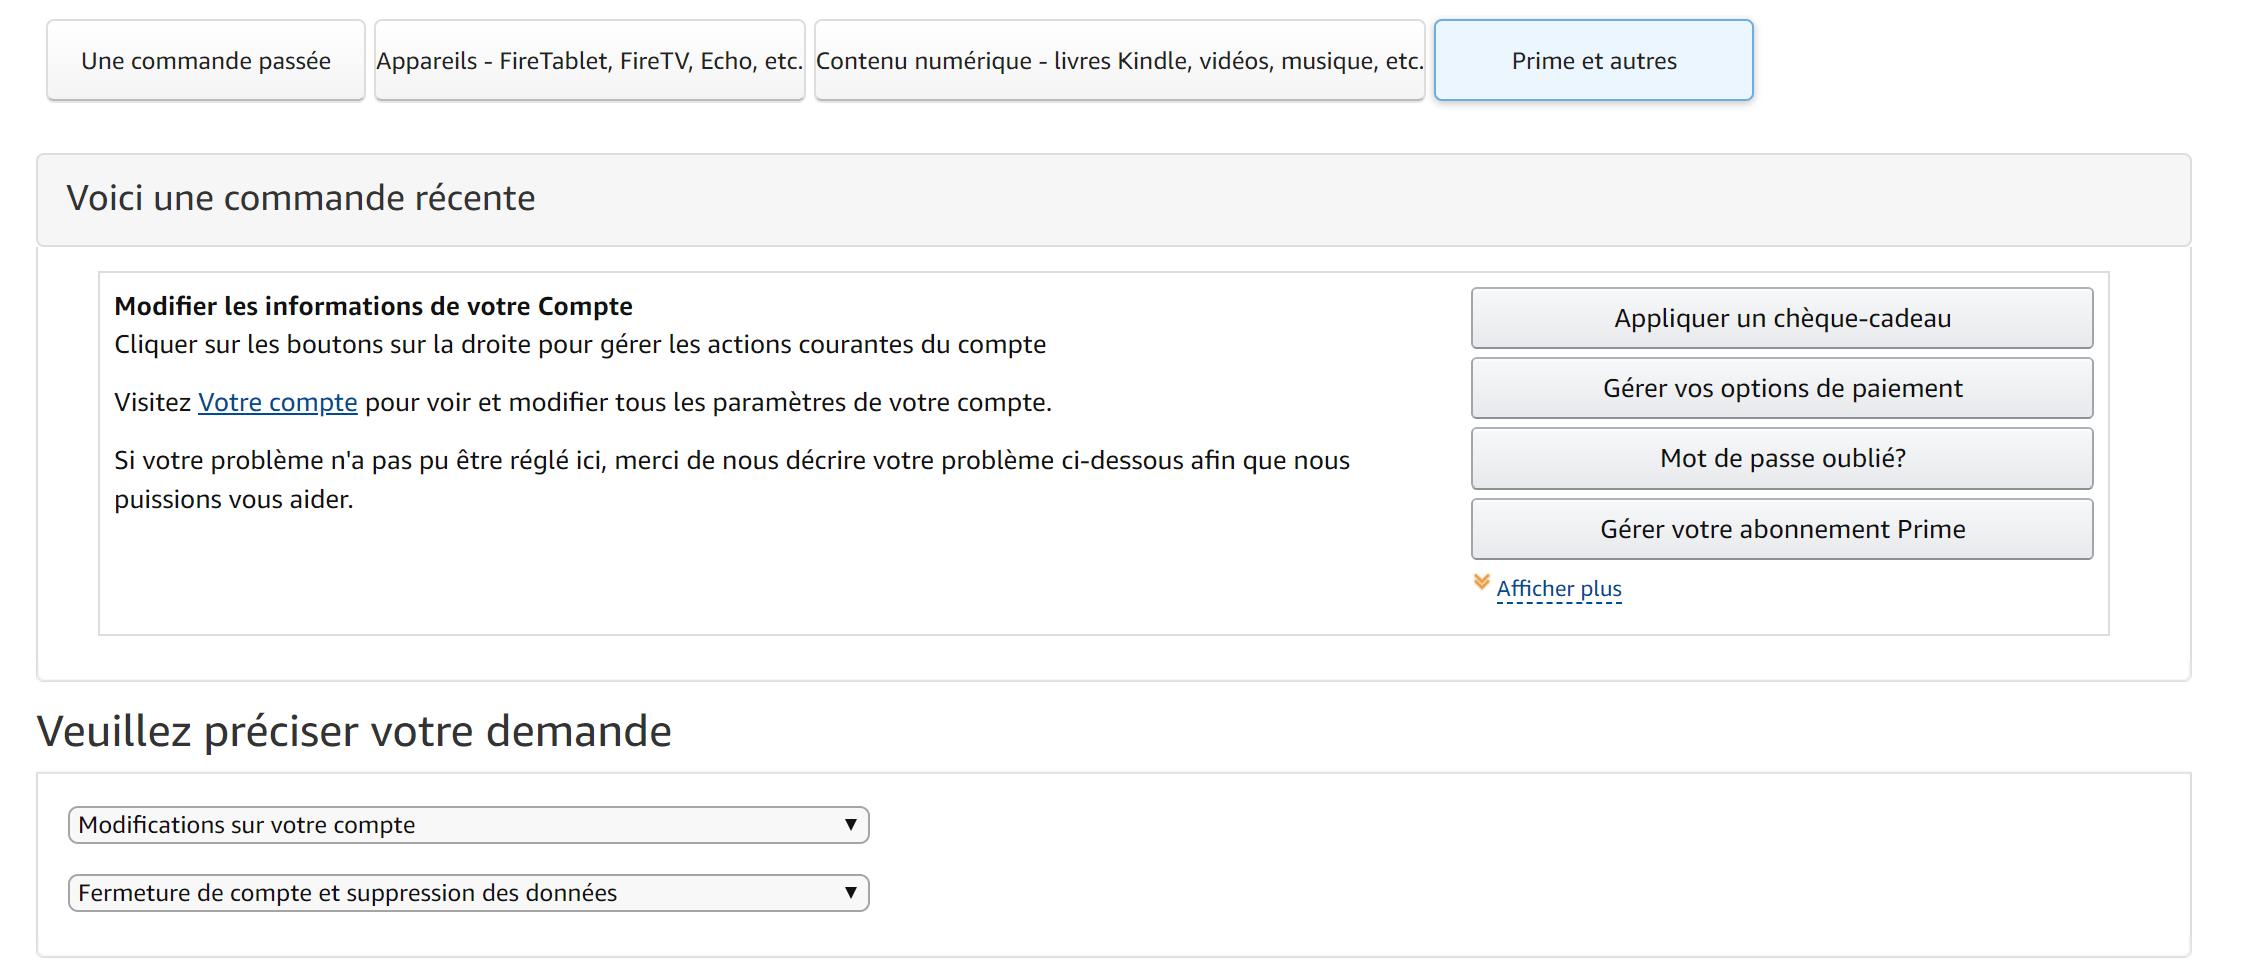 Comment Supprimer Son Compte Amazon Frandroid